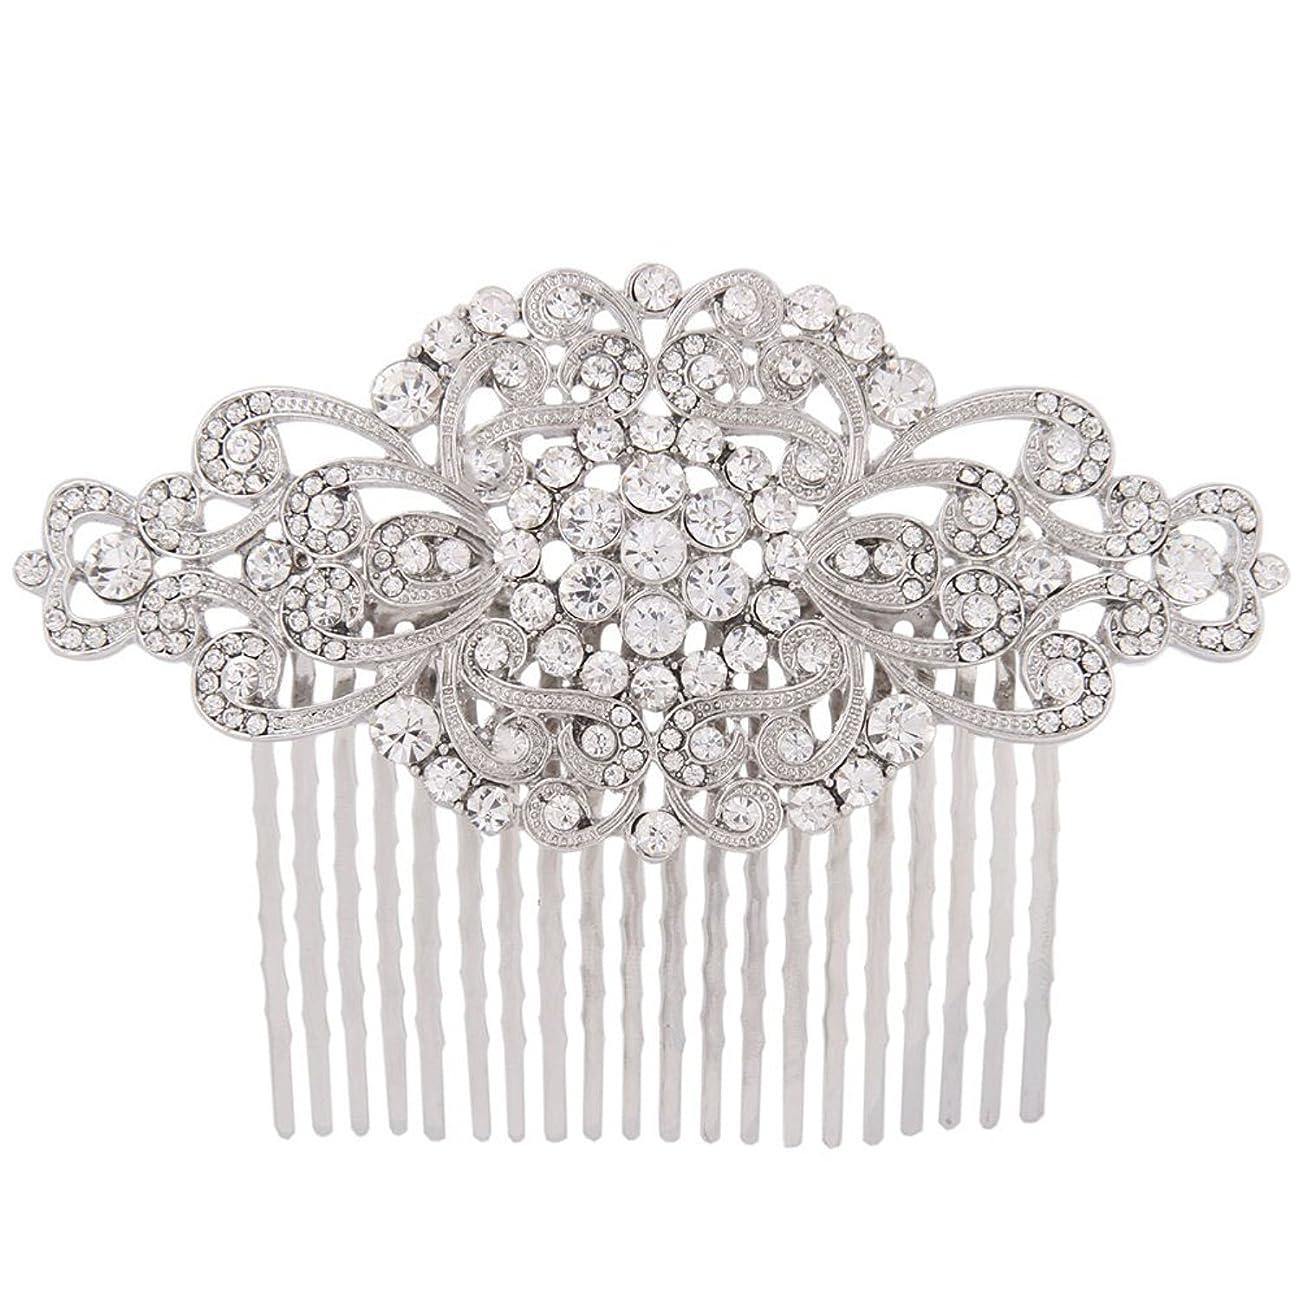 Fairy Moda Rhinestone Bridal Hair Comb Silver Wedding Bridesmaid Gift Vintage Hair Piece 0